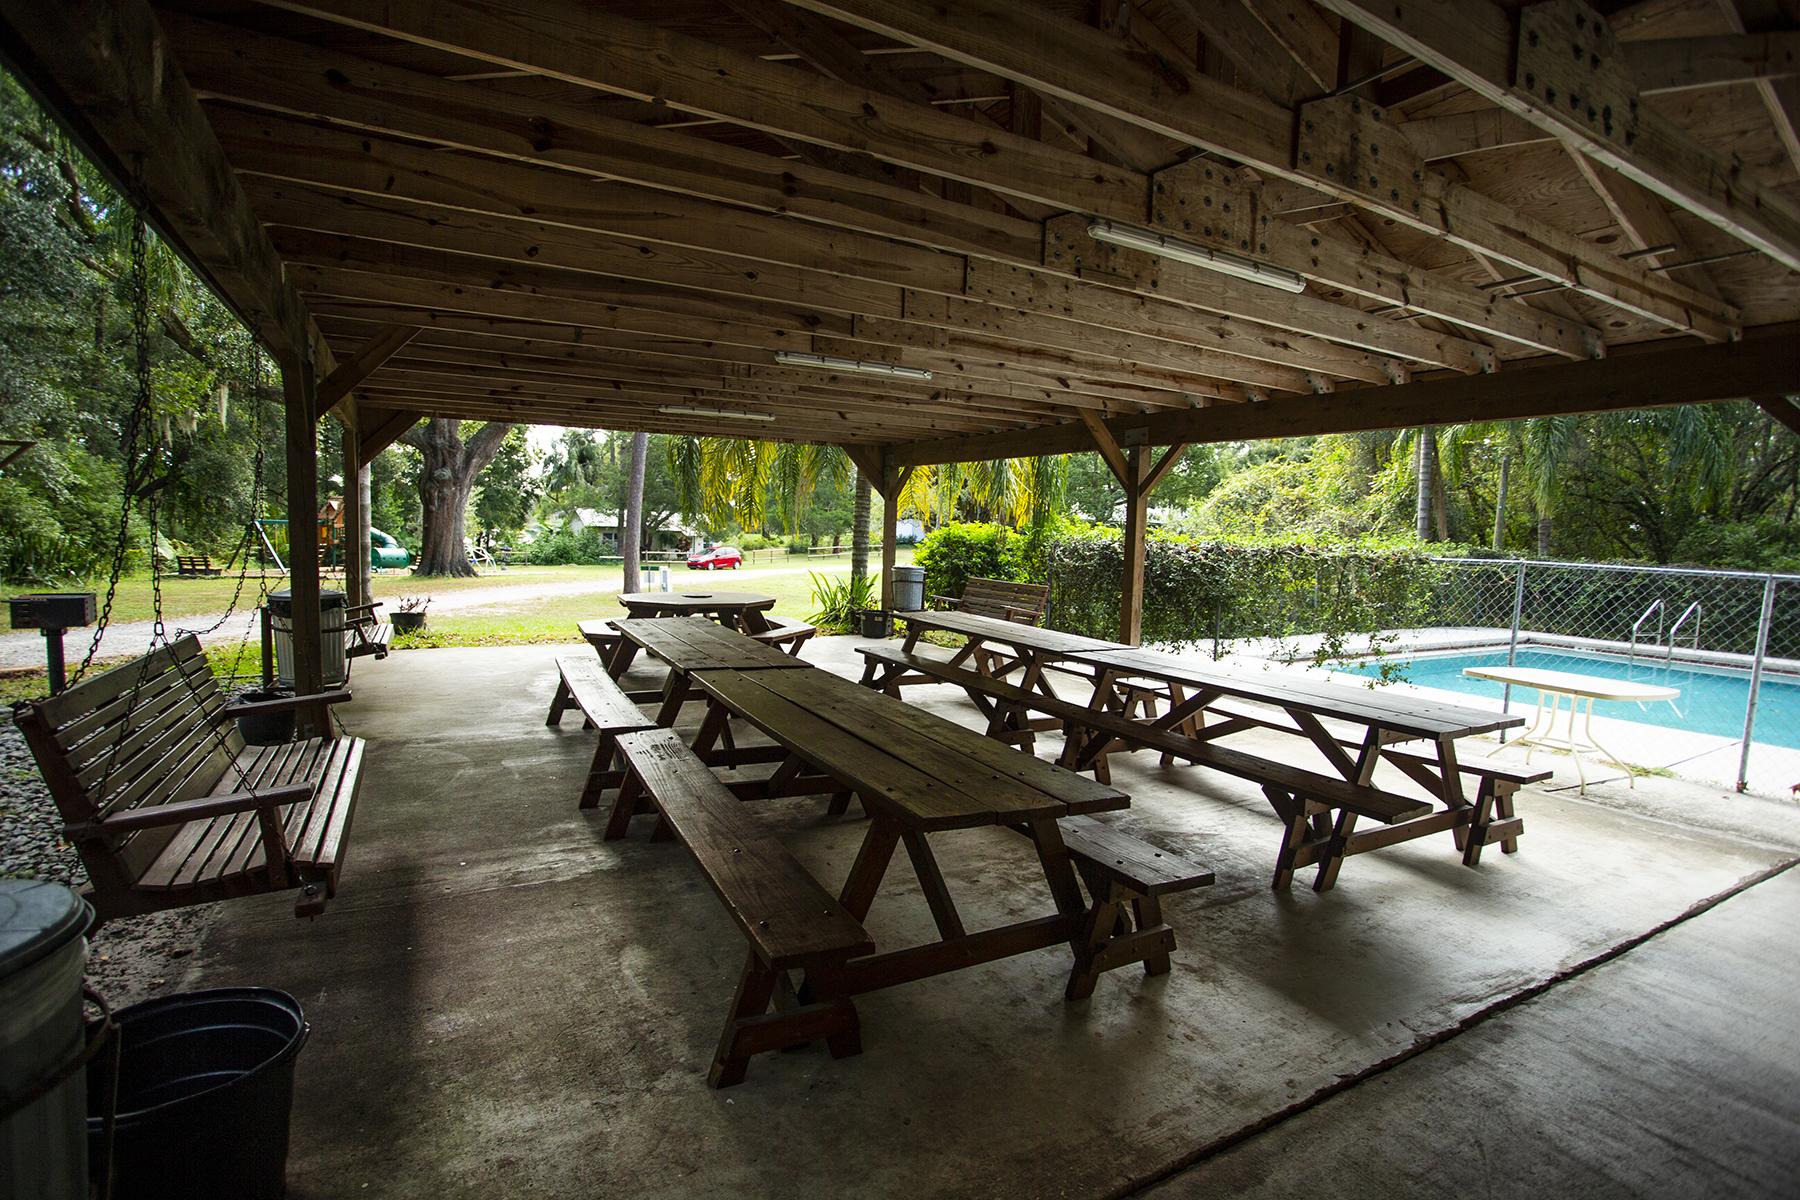 Pool & Pool House - Camp and Retreat